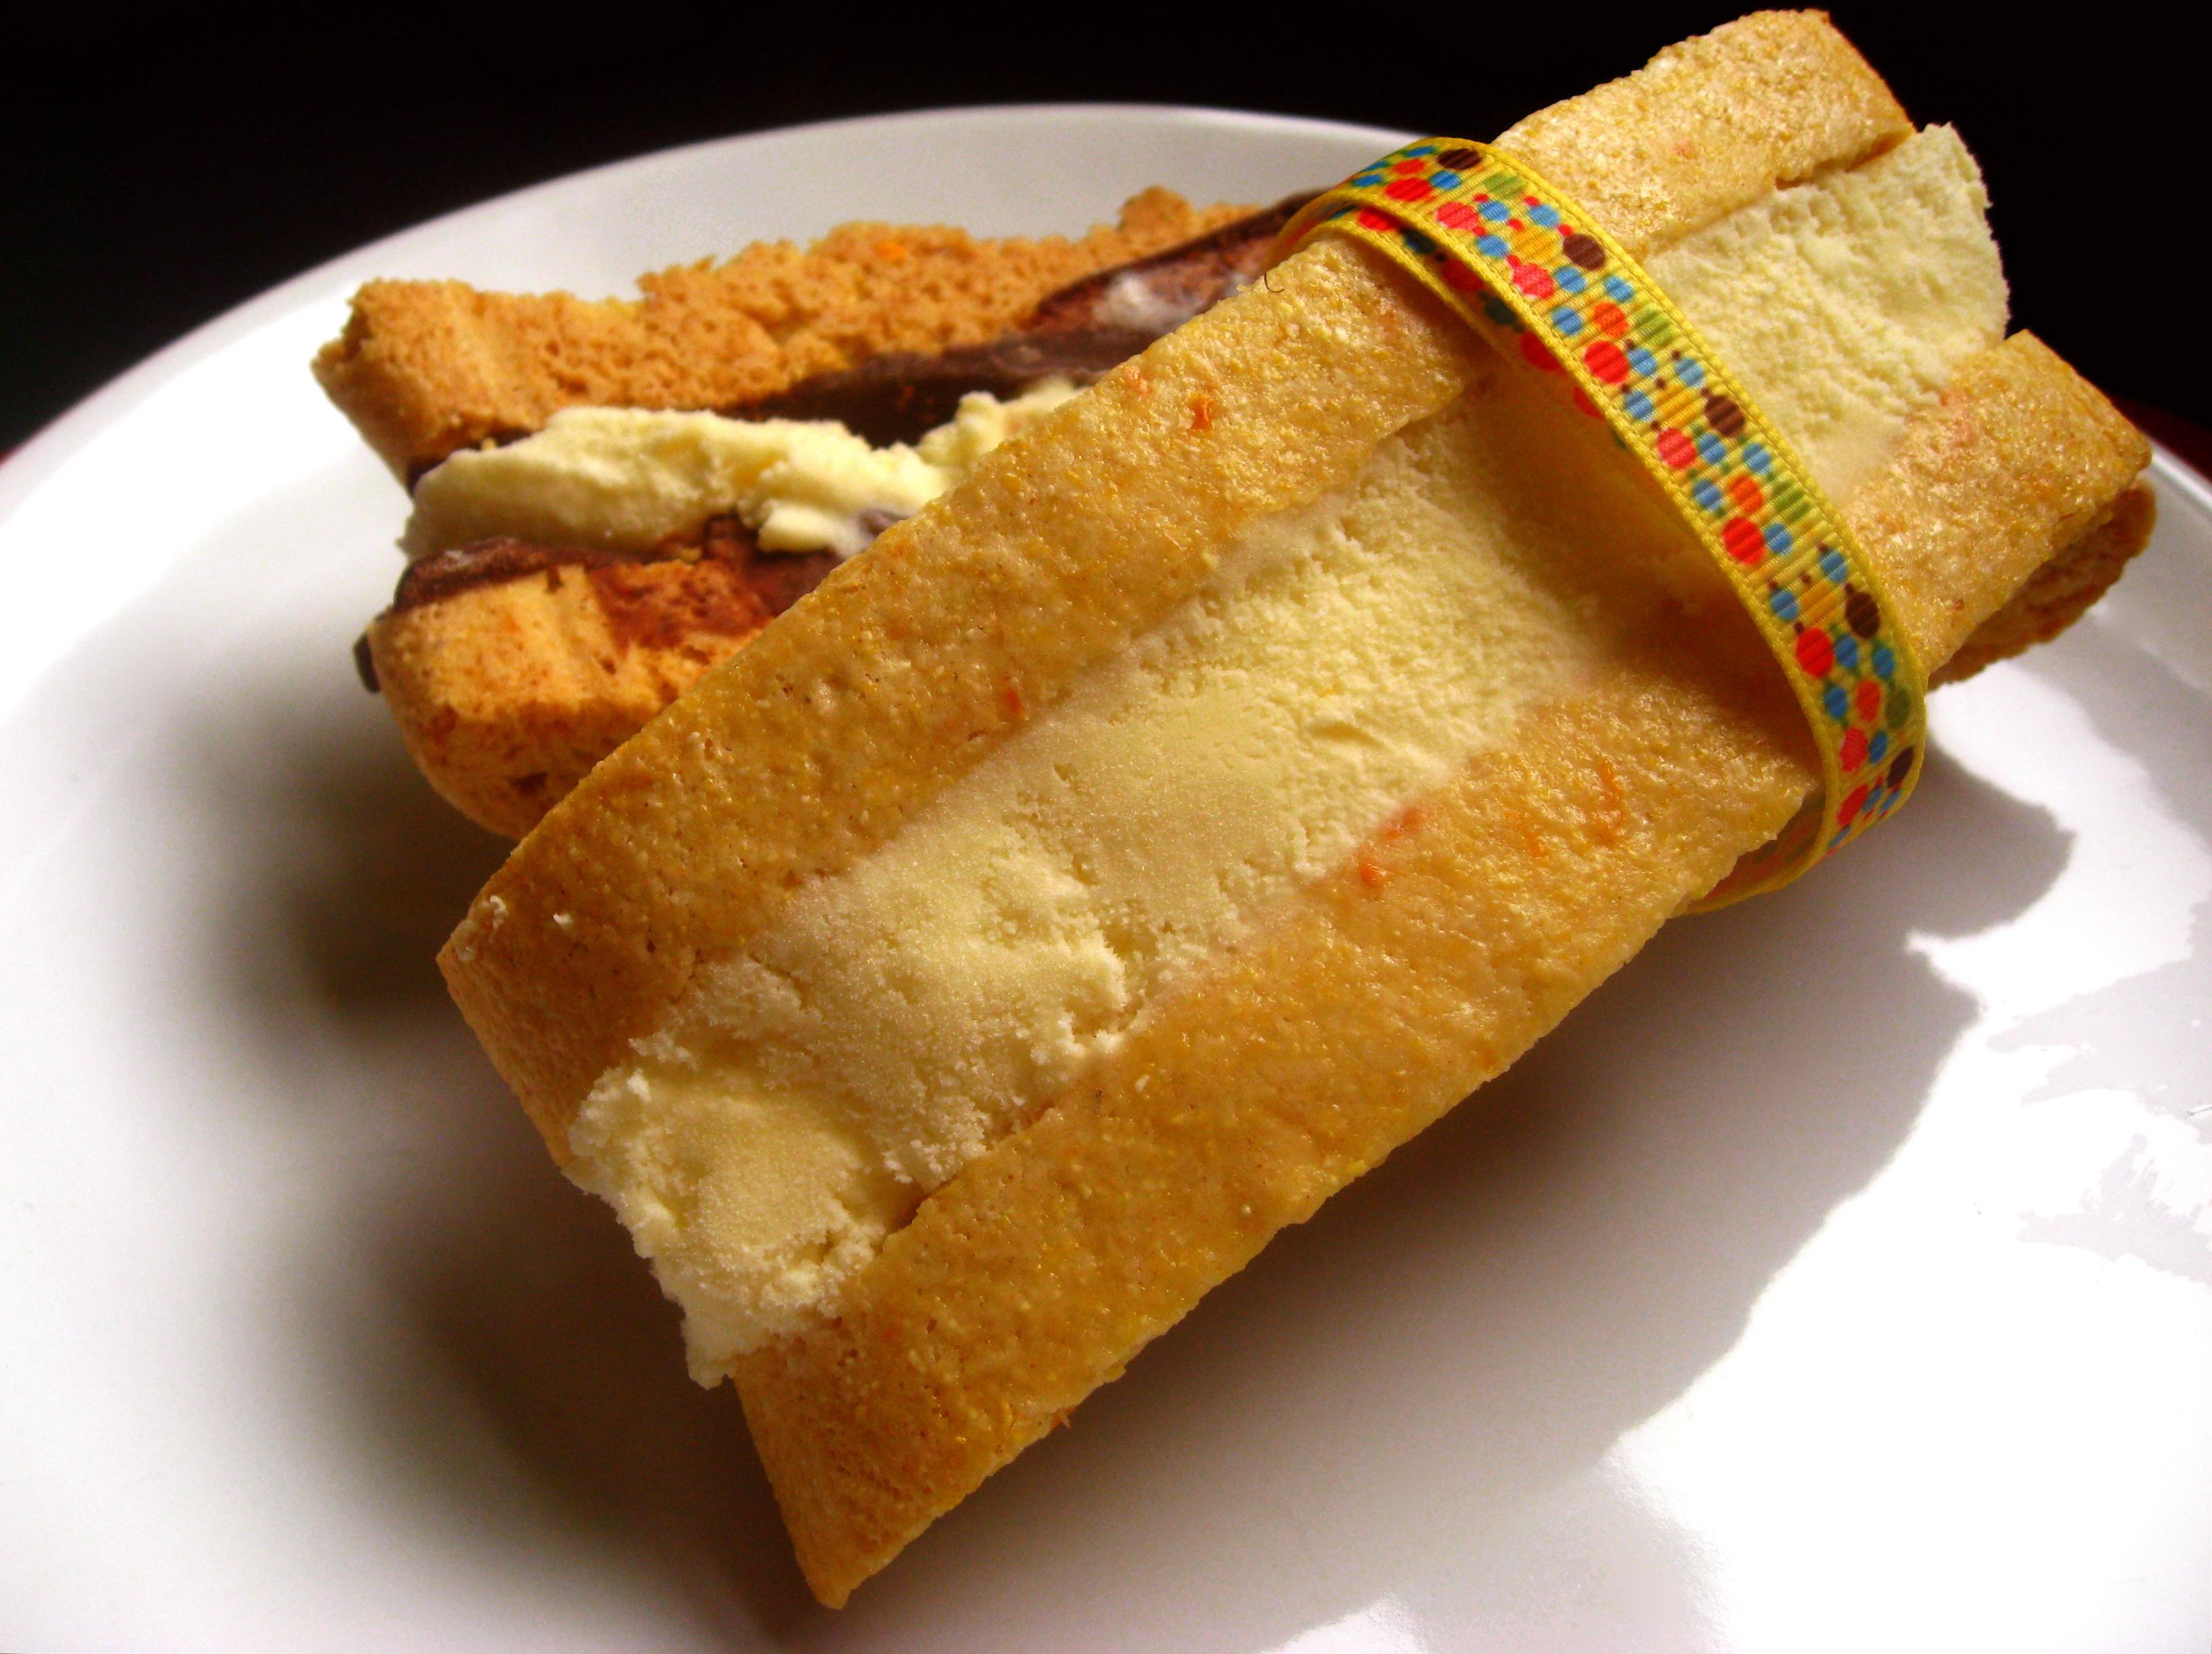 Summer of Sandwiches: Chocolate Citrus Biscotti with Orange Ice Cream